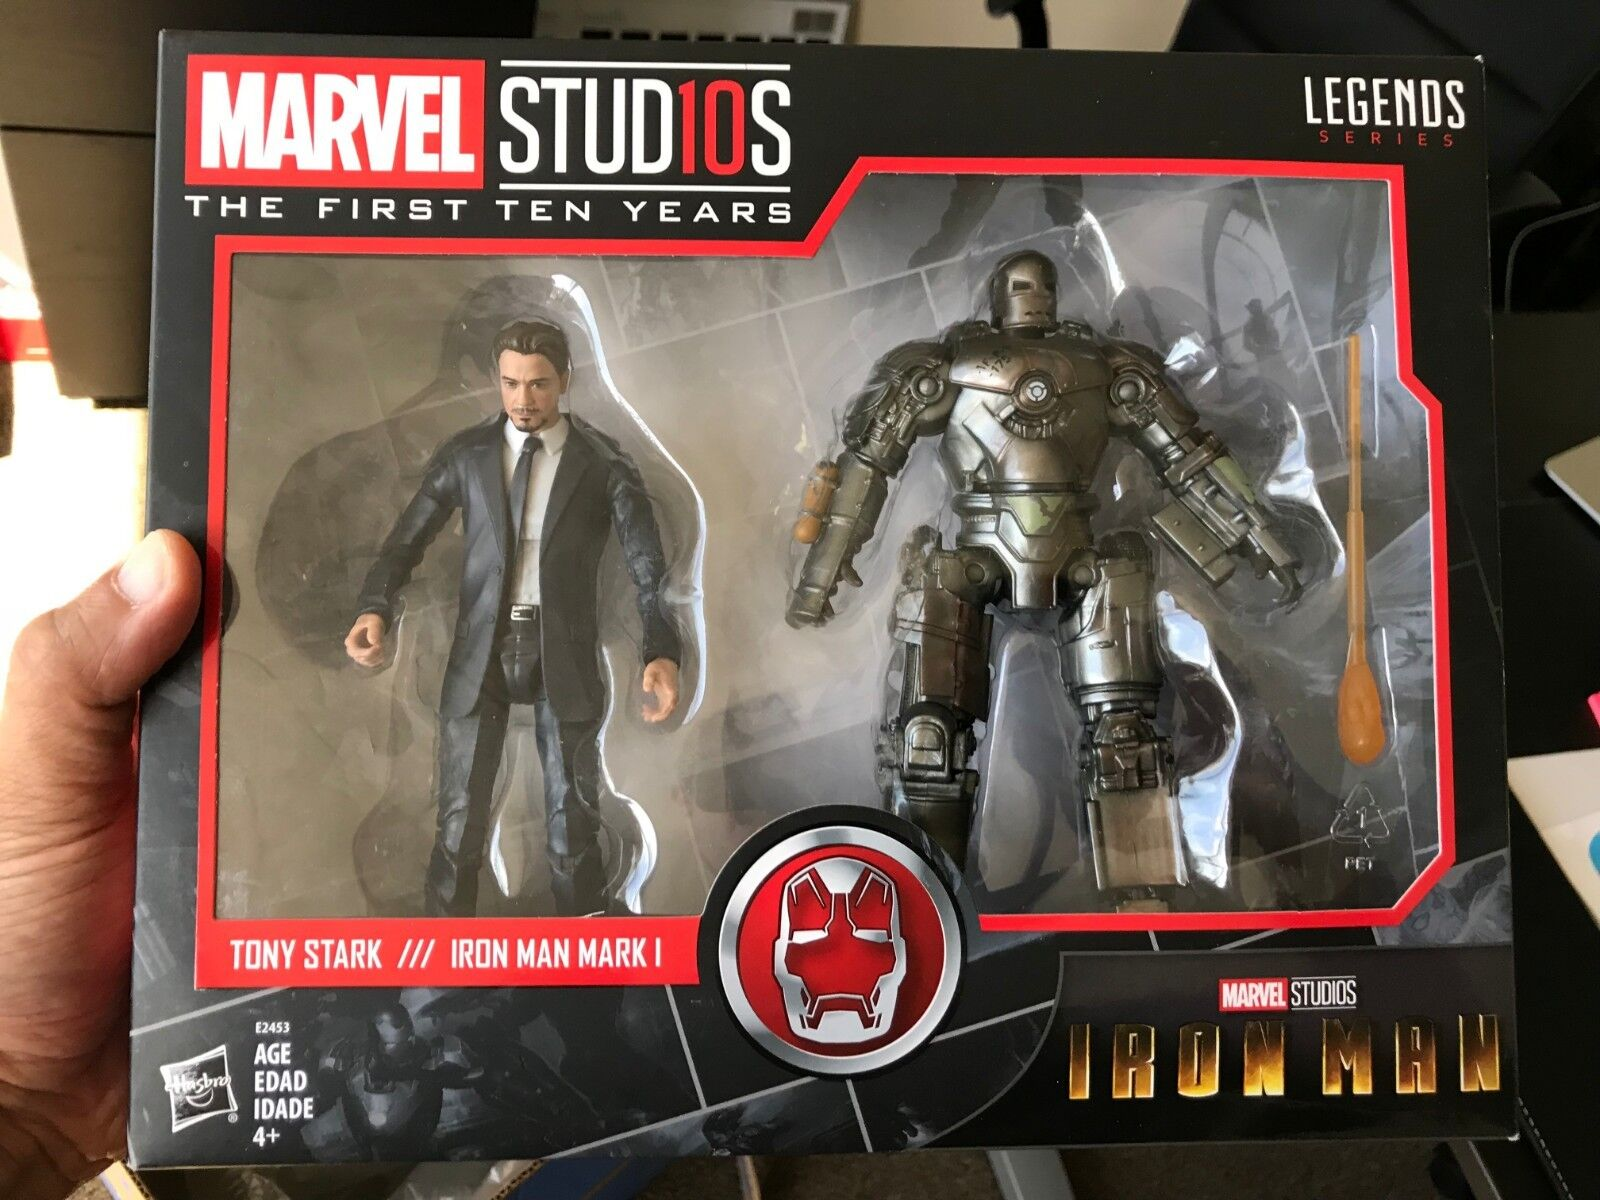 Marvel Legends MCU First Ten 10  Years Tony Stark Iron Man Mark I Sealed In Hand  envoi gratuit dans le monde entier